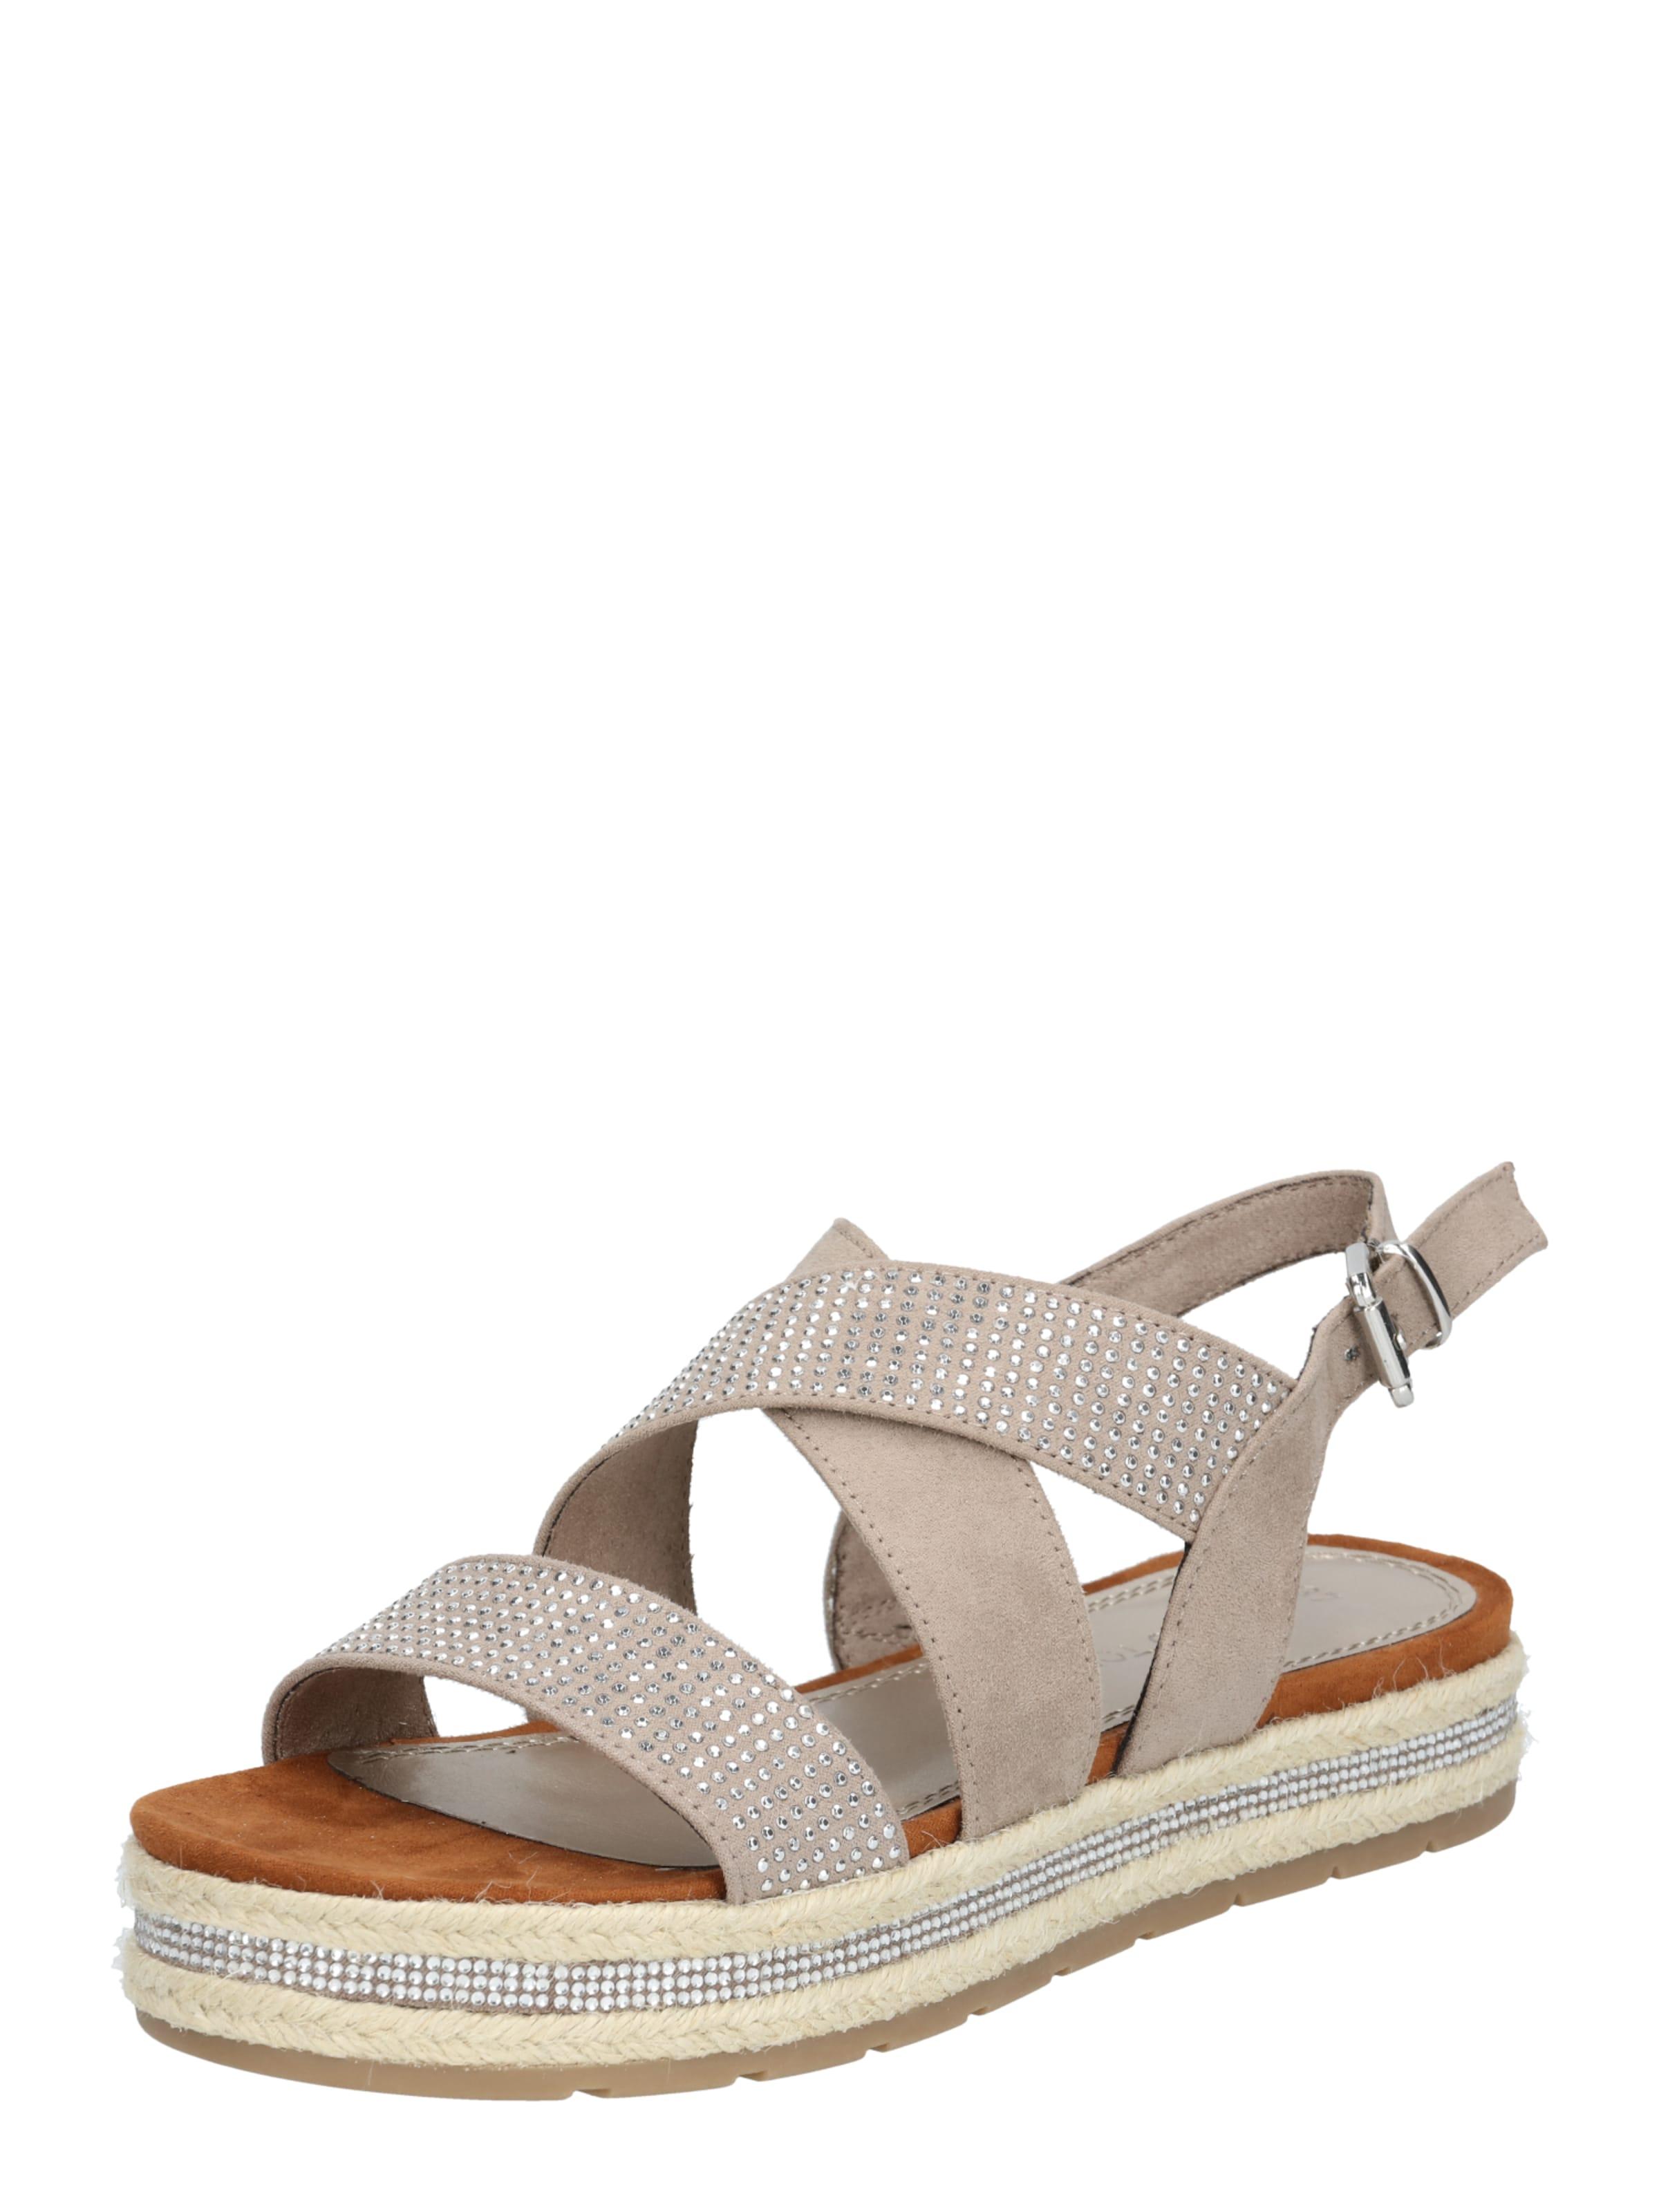 Haltbare Mode billige Schuhe MARCO Schuhe TOZZI | Sandale Schuhe MARCO Gut getragene Schuhe 6d988f